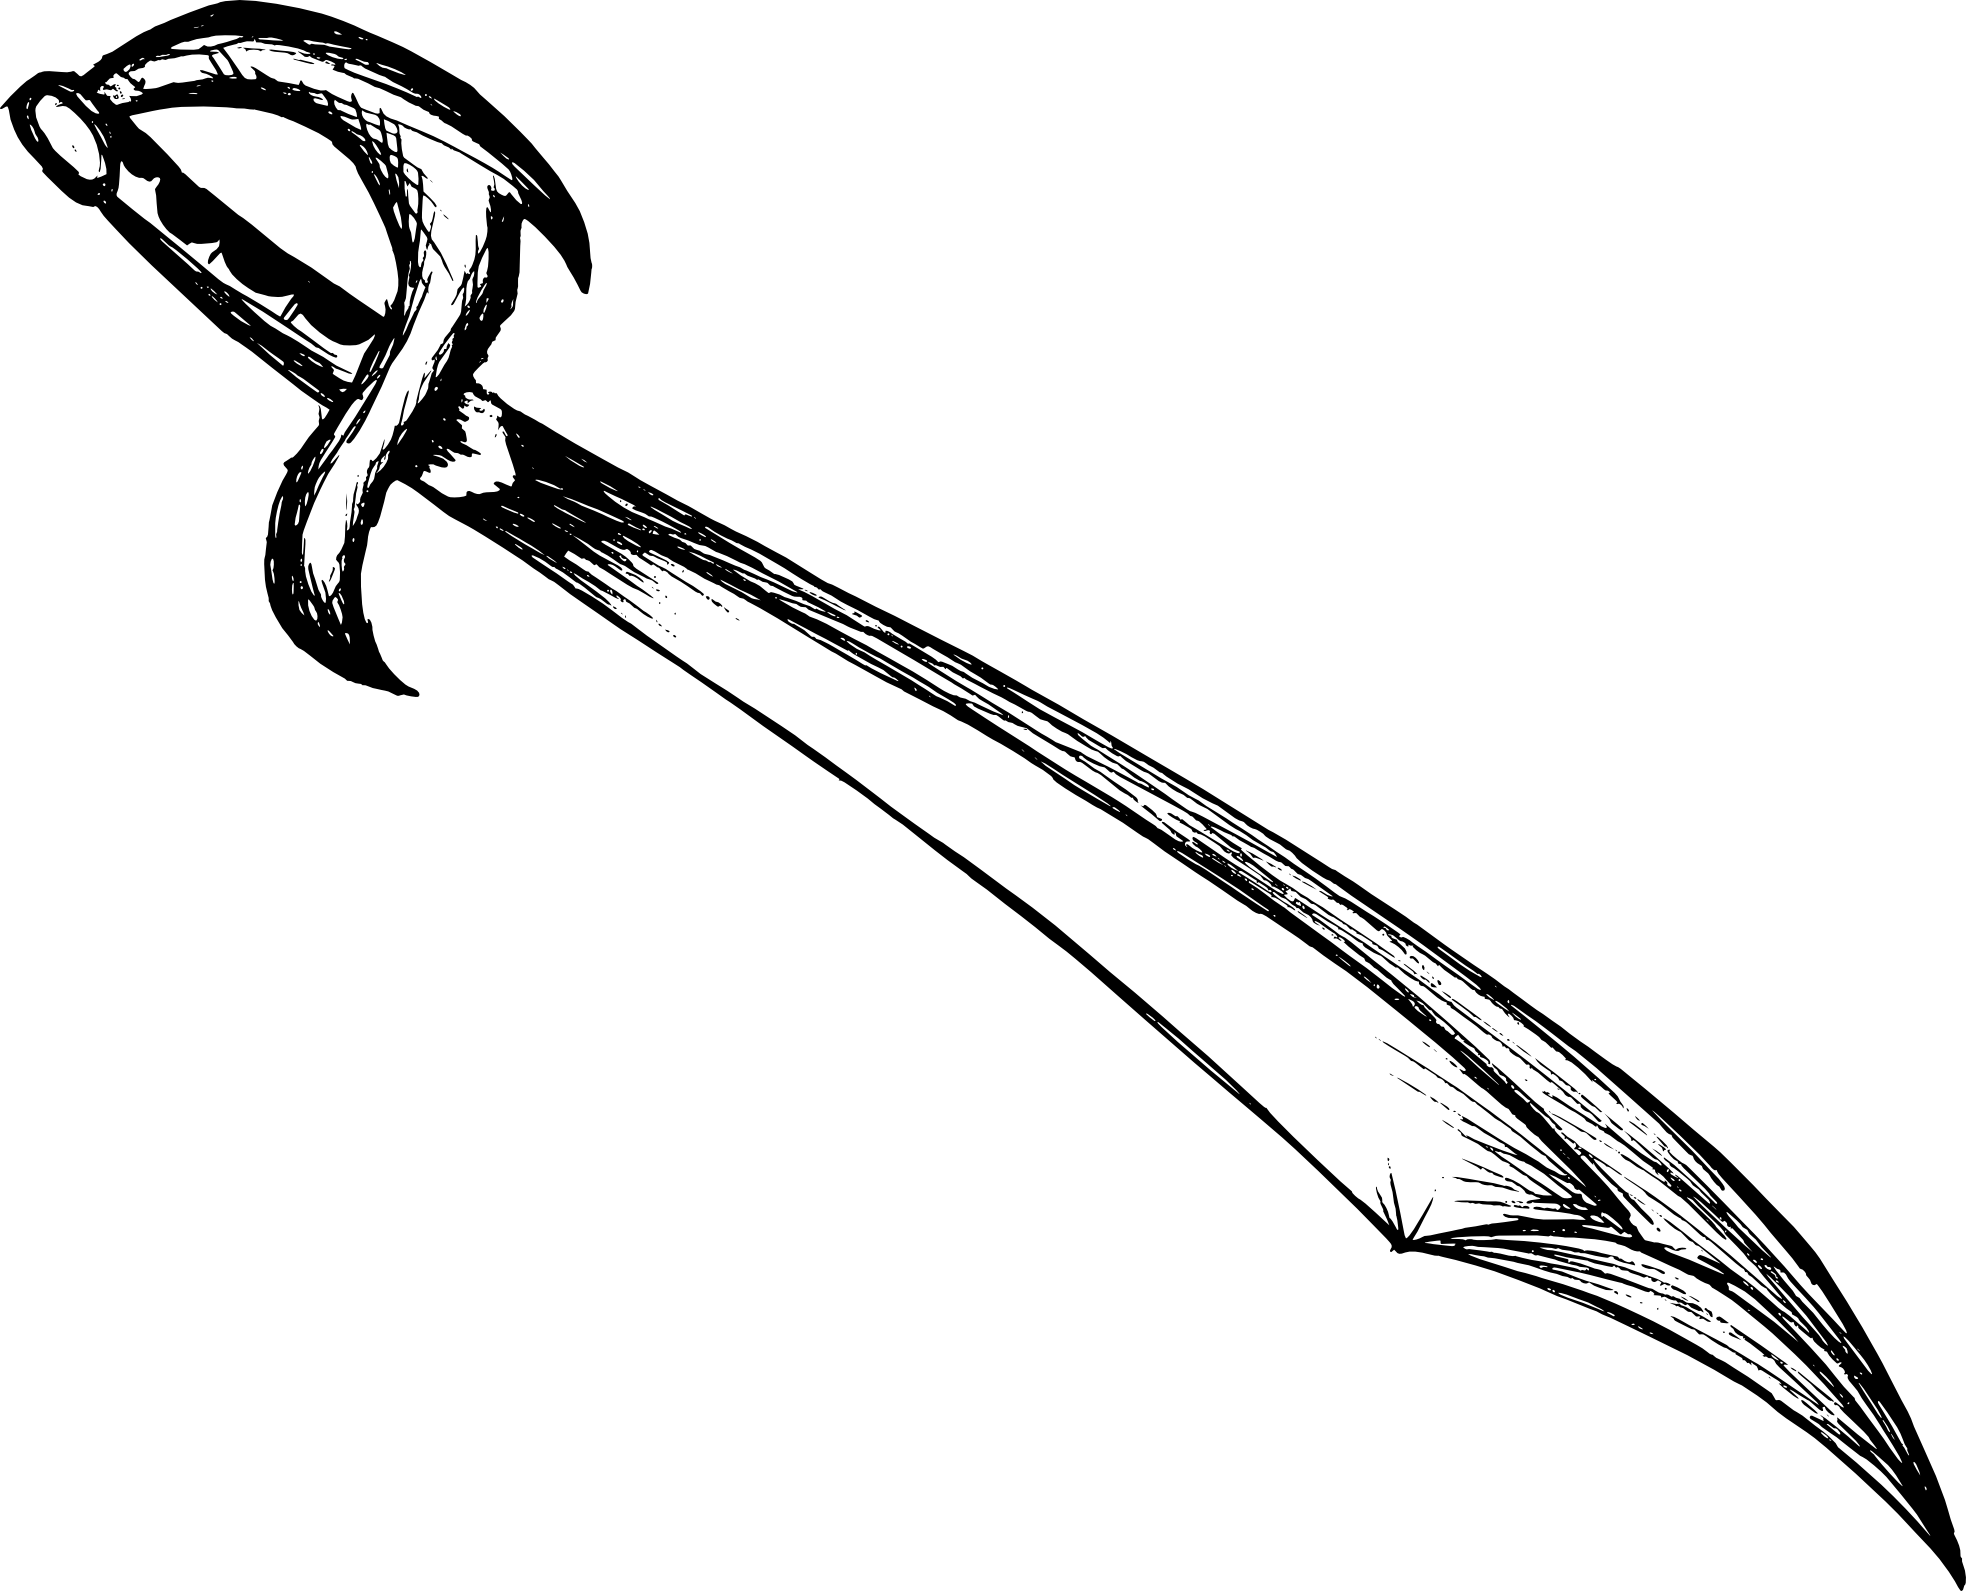 6 Sword Drawing (PNG Transparent) | OnlyGFX.com